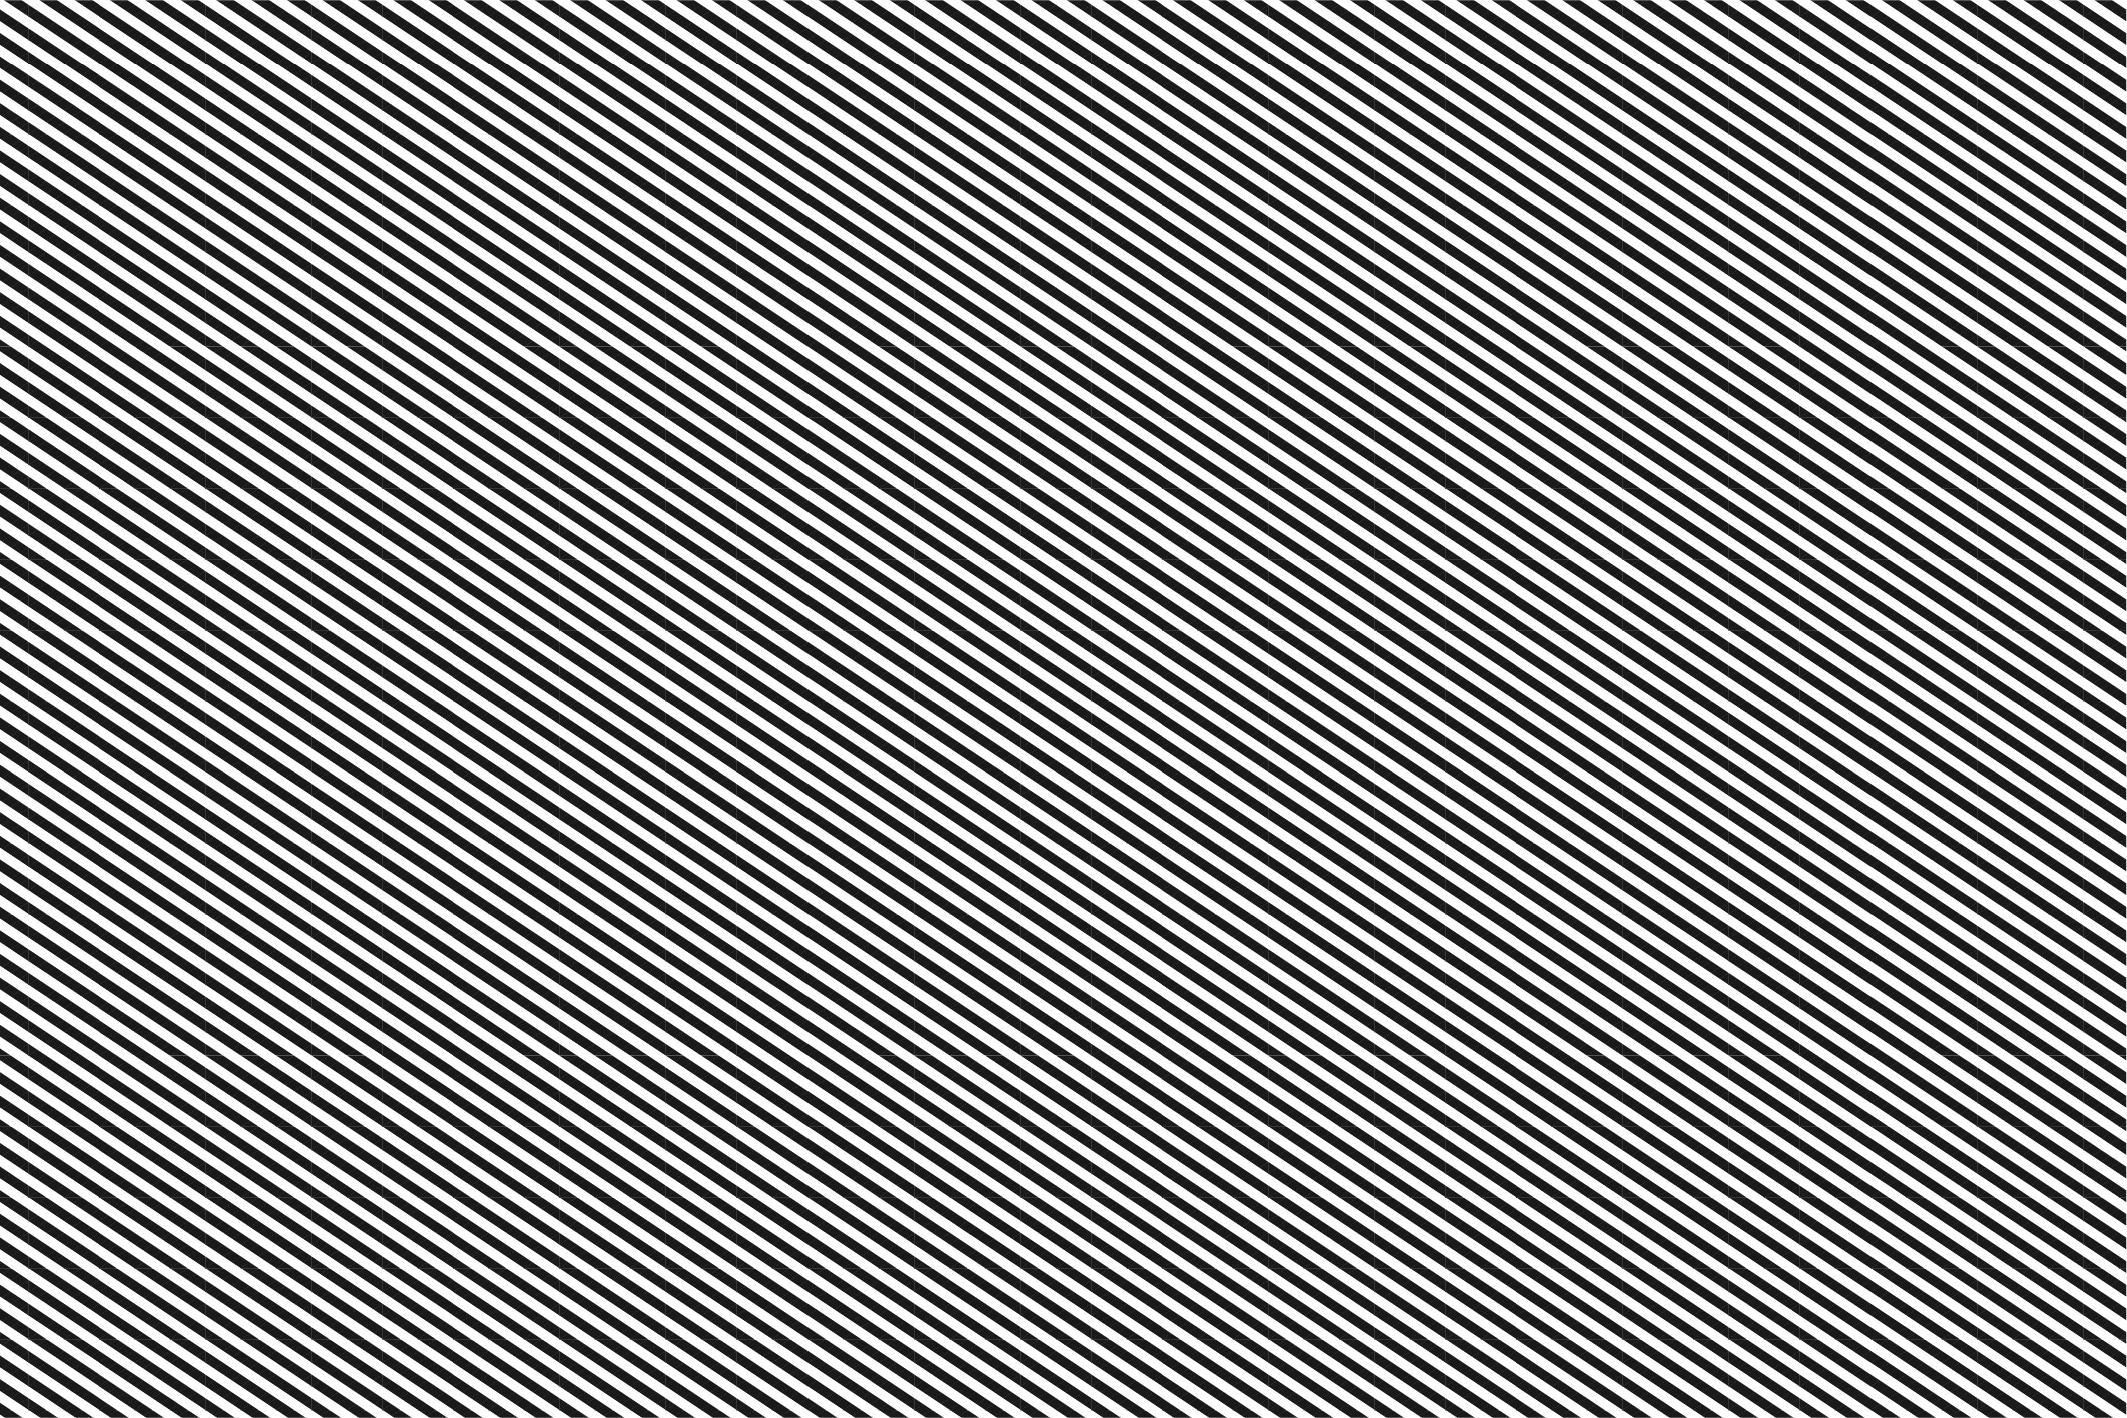 Striped seamless patterns set. example image 8